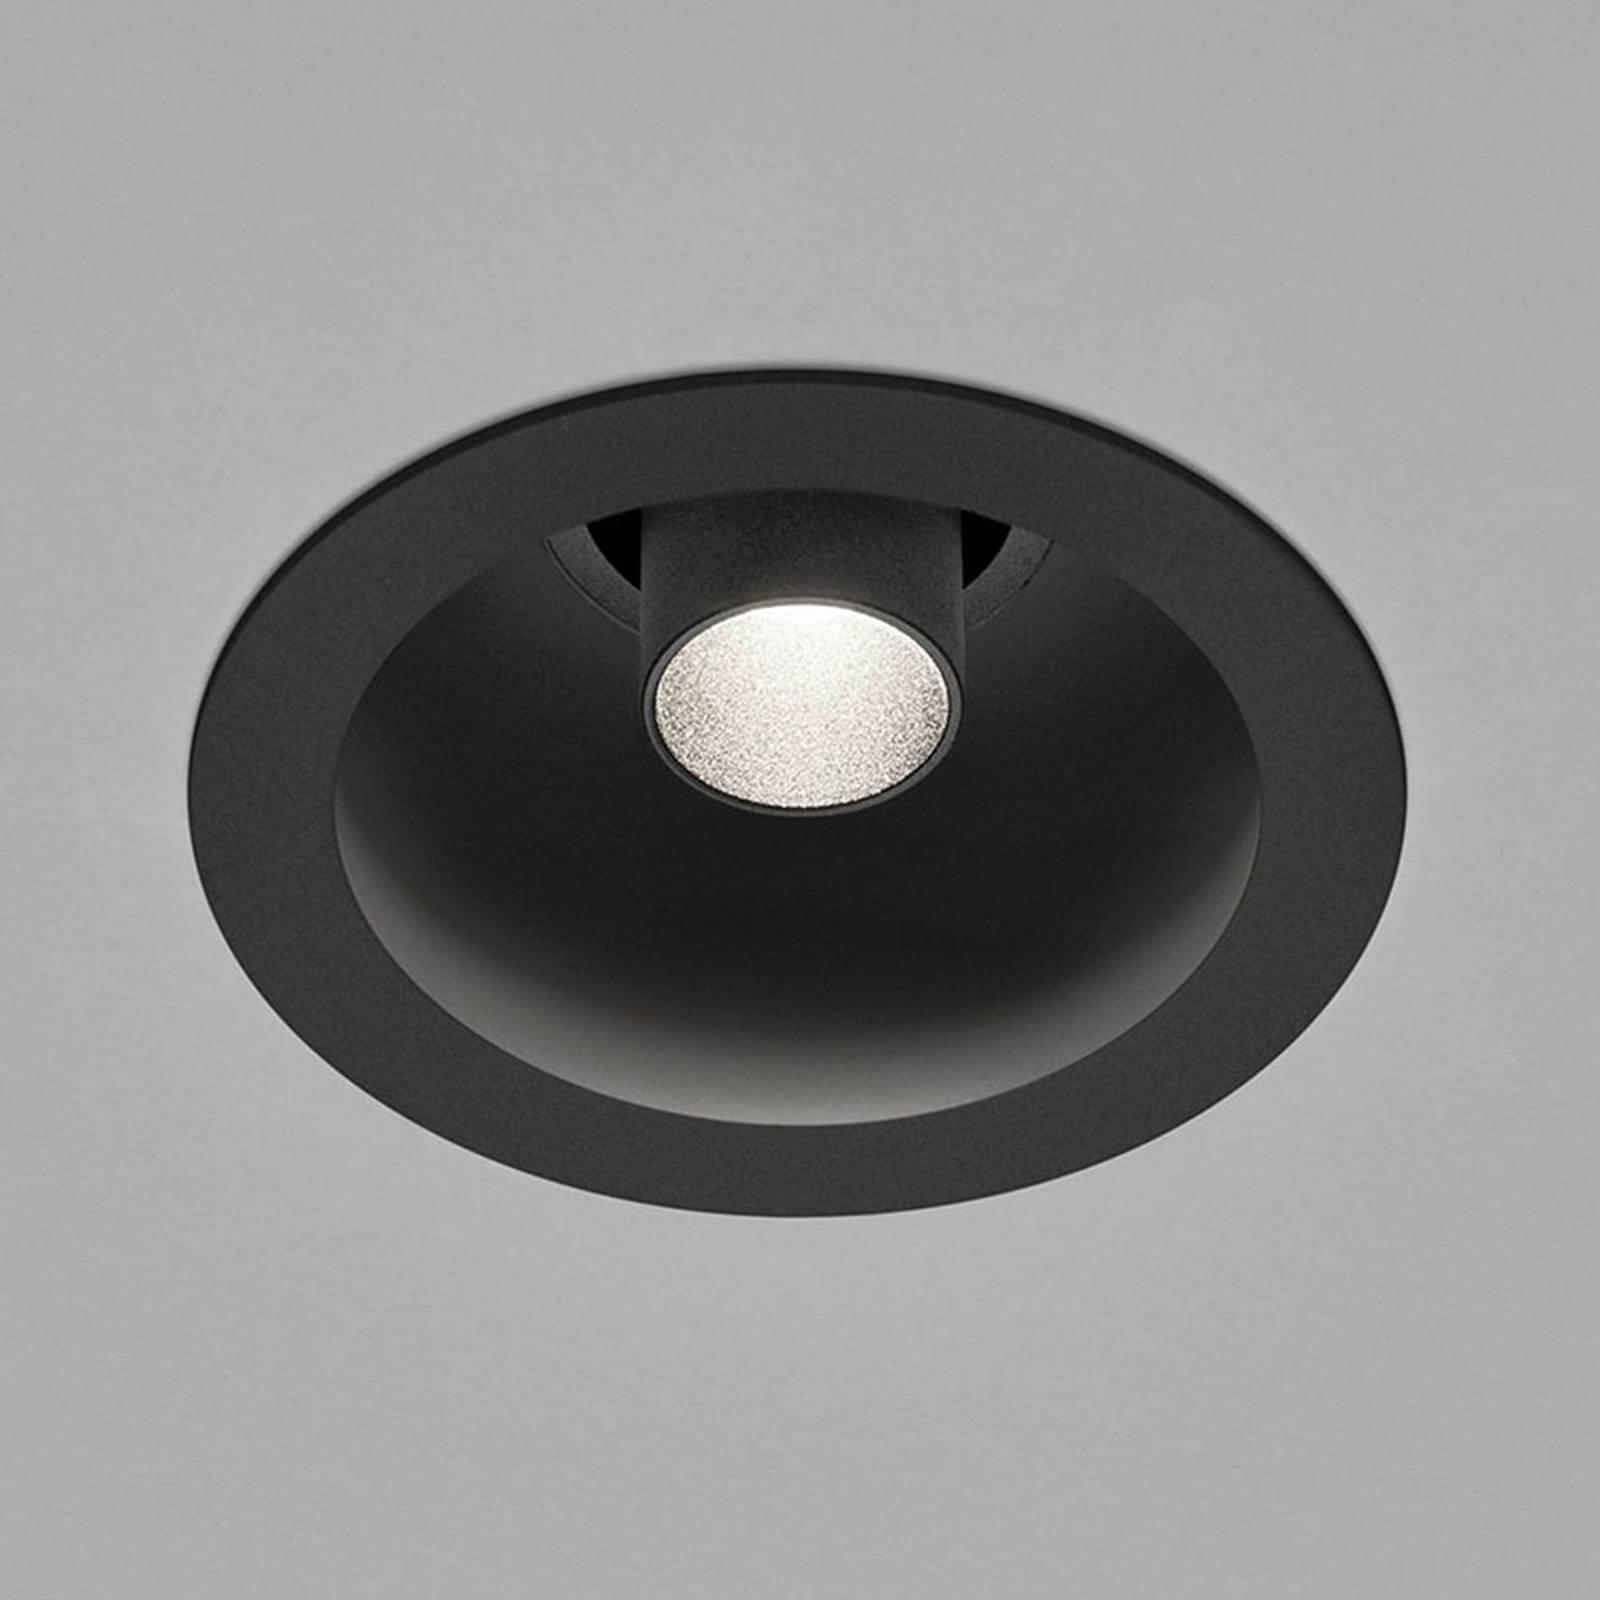 Helestra Run LED-downlight, 1 lyskilde svart/svart